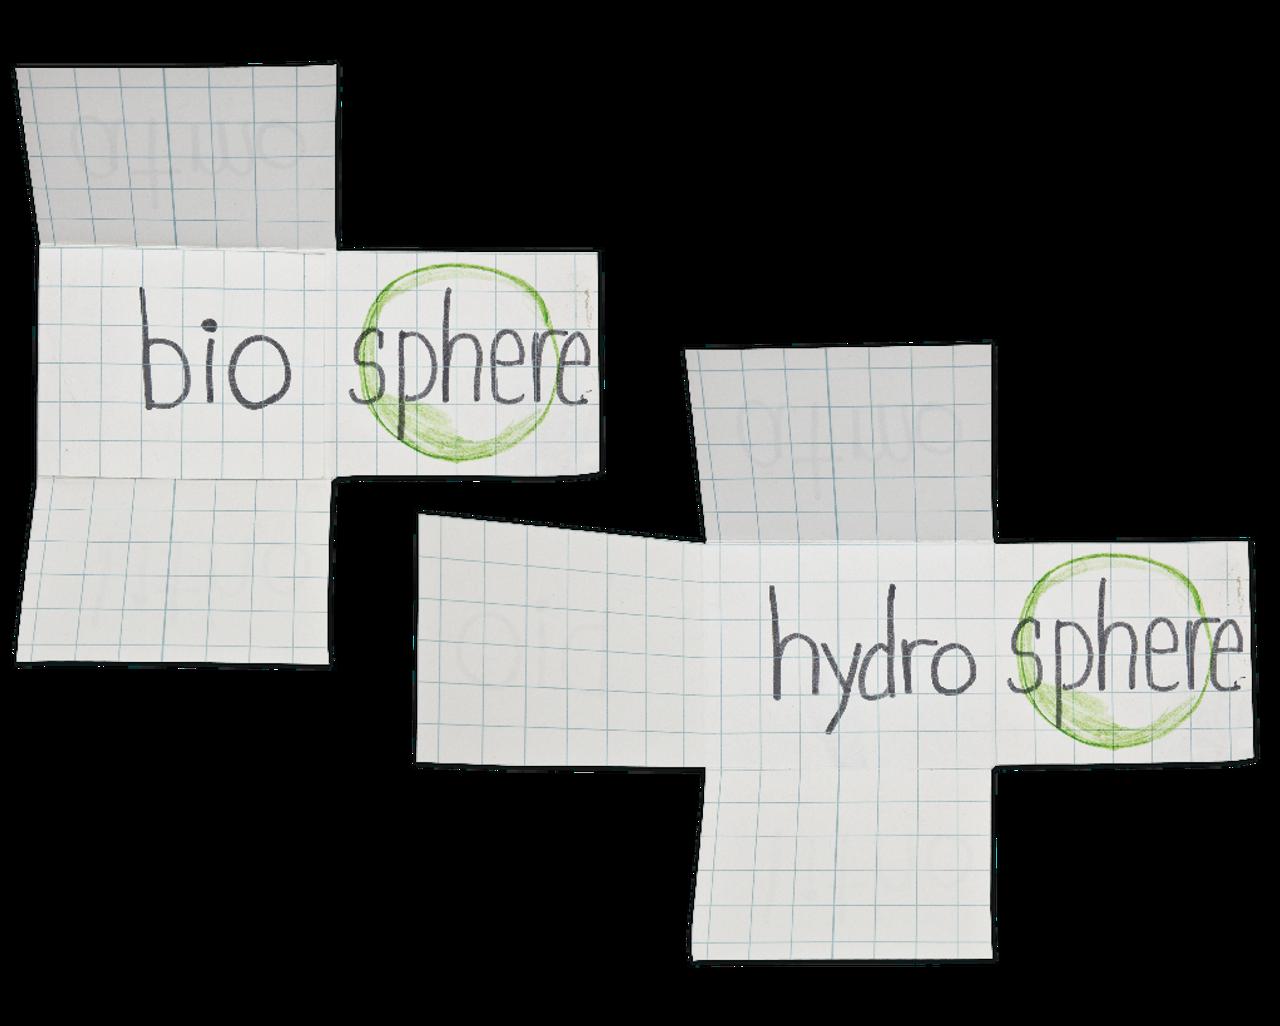 Biosphere-hemisphere